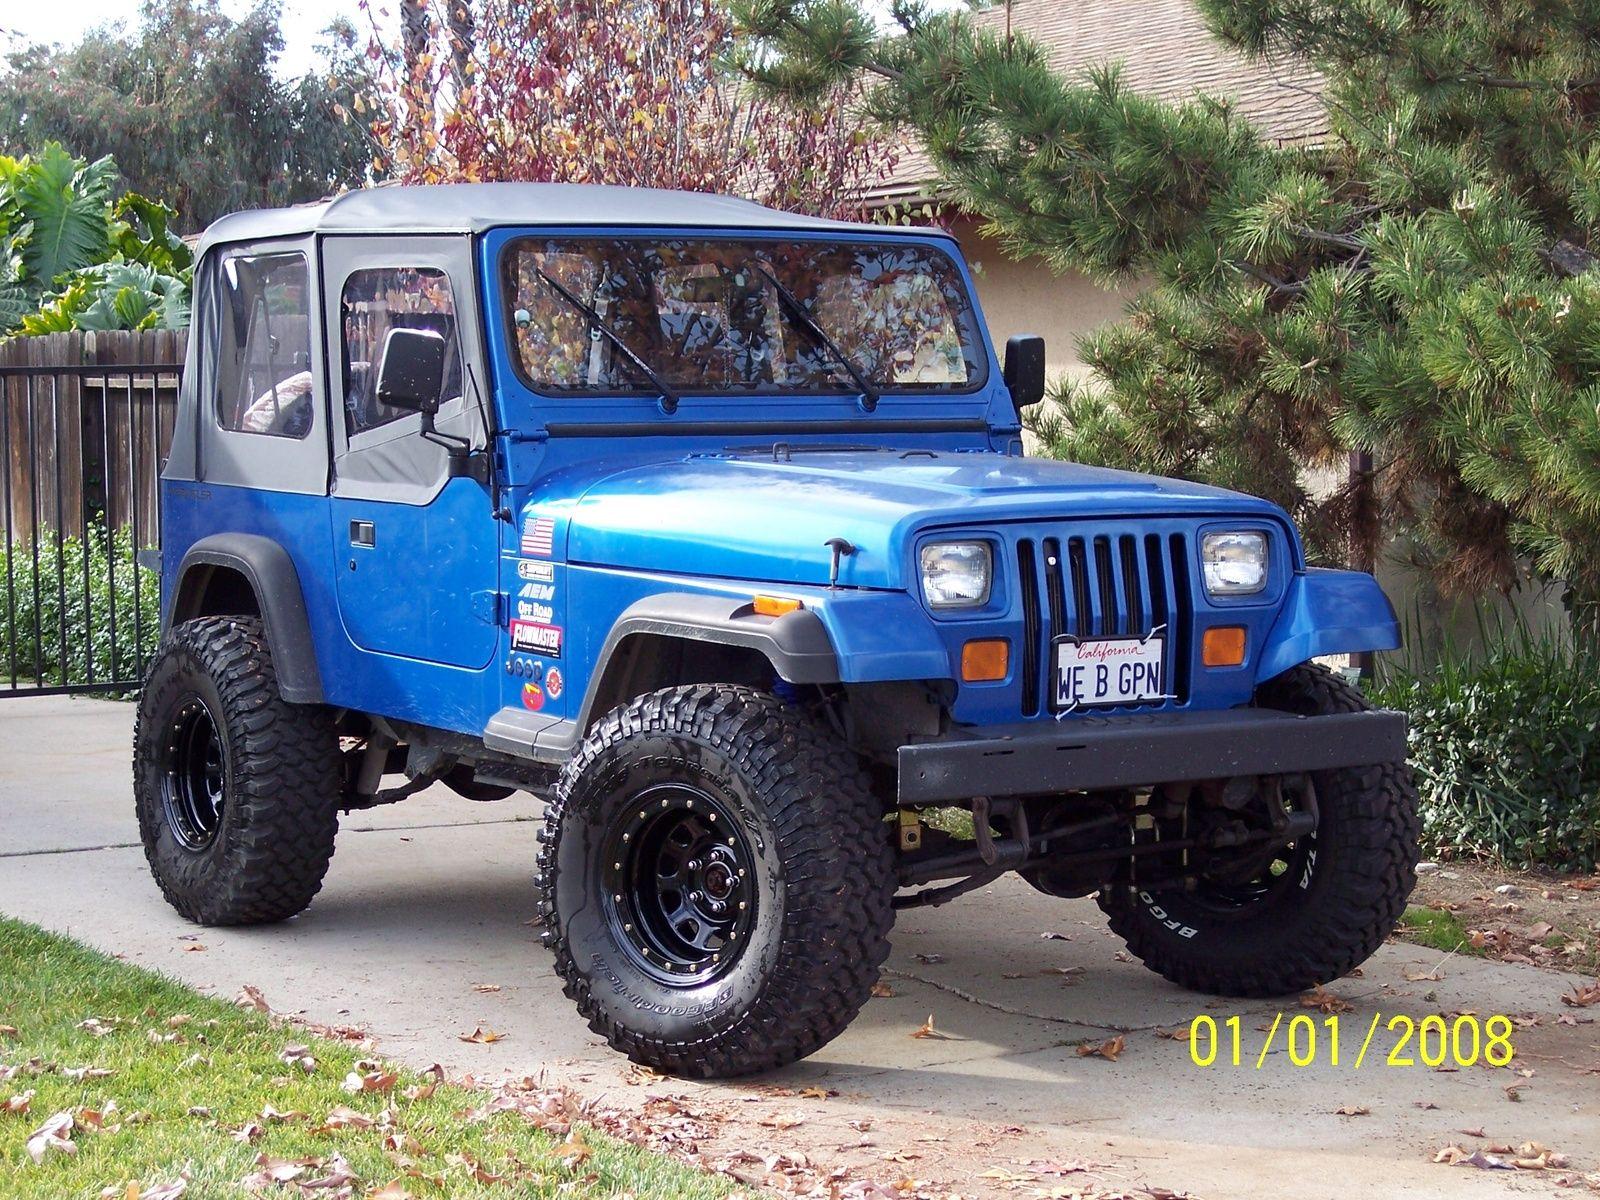 1993 Jeep Wrangler Pictures Cargurus Jeep Wrangler Jeep Yj Jeep Wrangler Yj